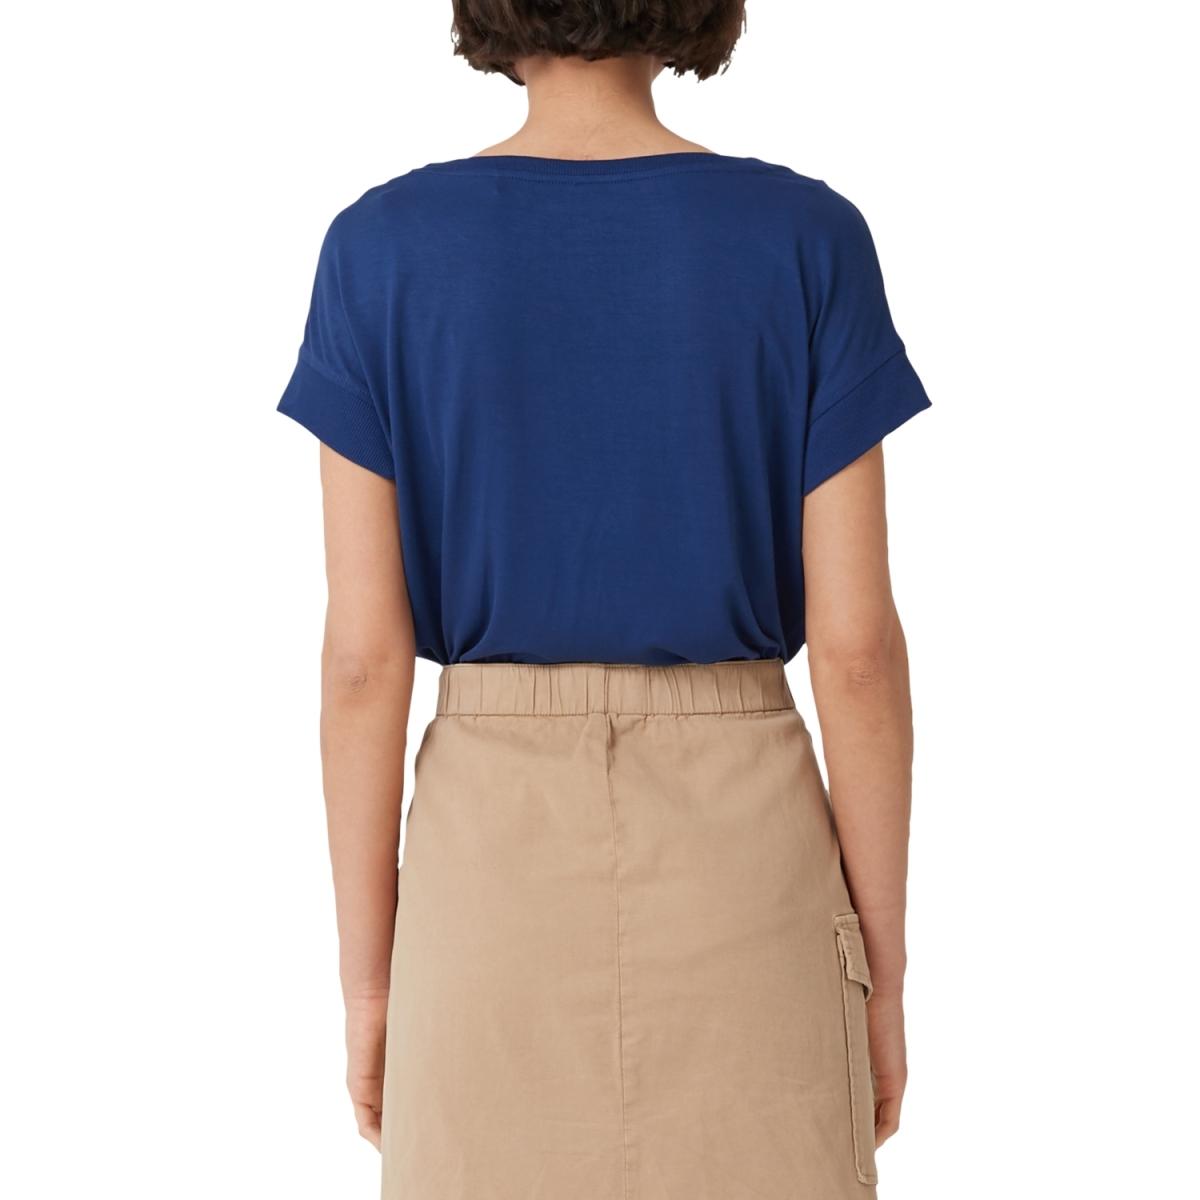 t shirt met brede ribboordjes 04899325098 s.oliver t-shirt 5639